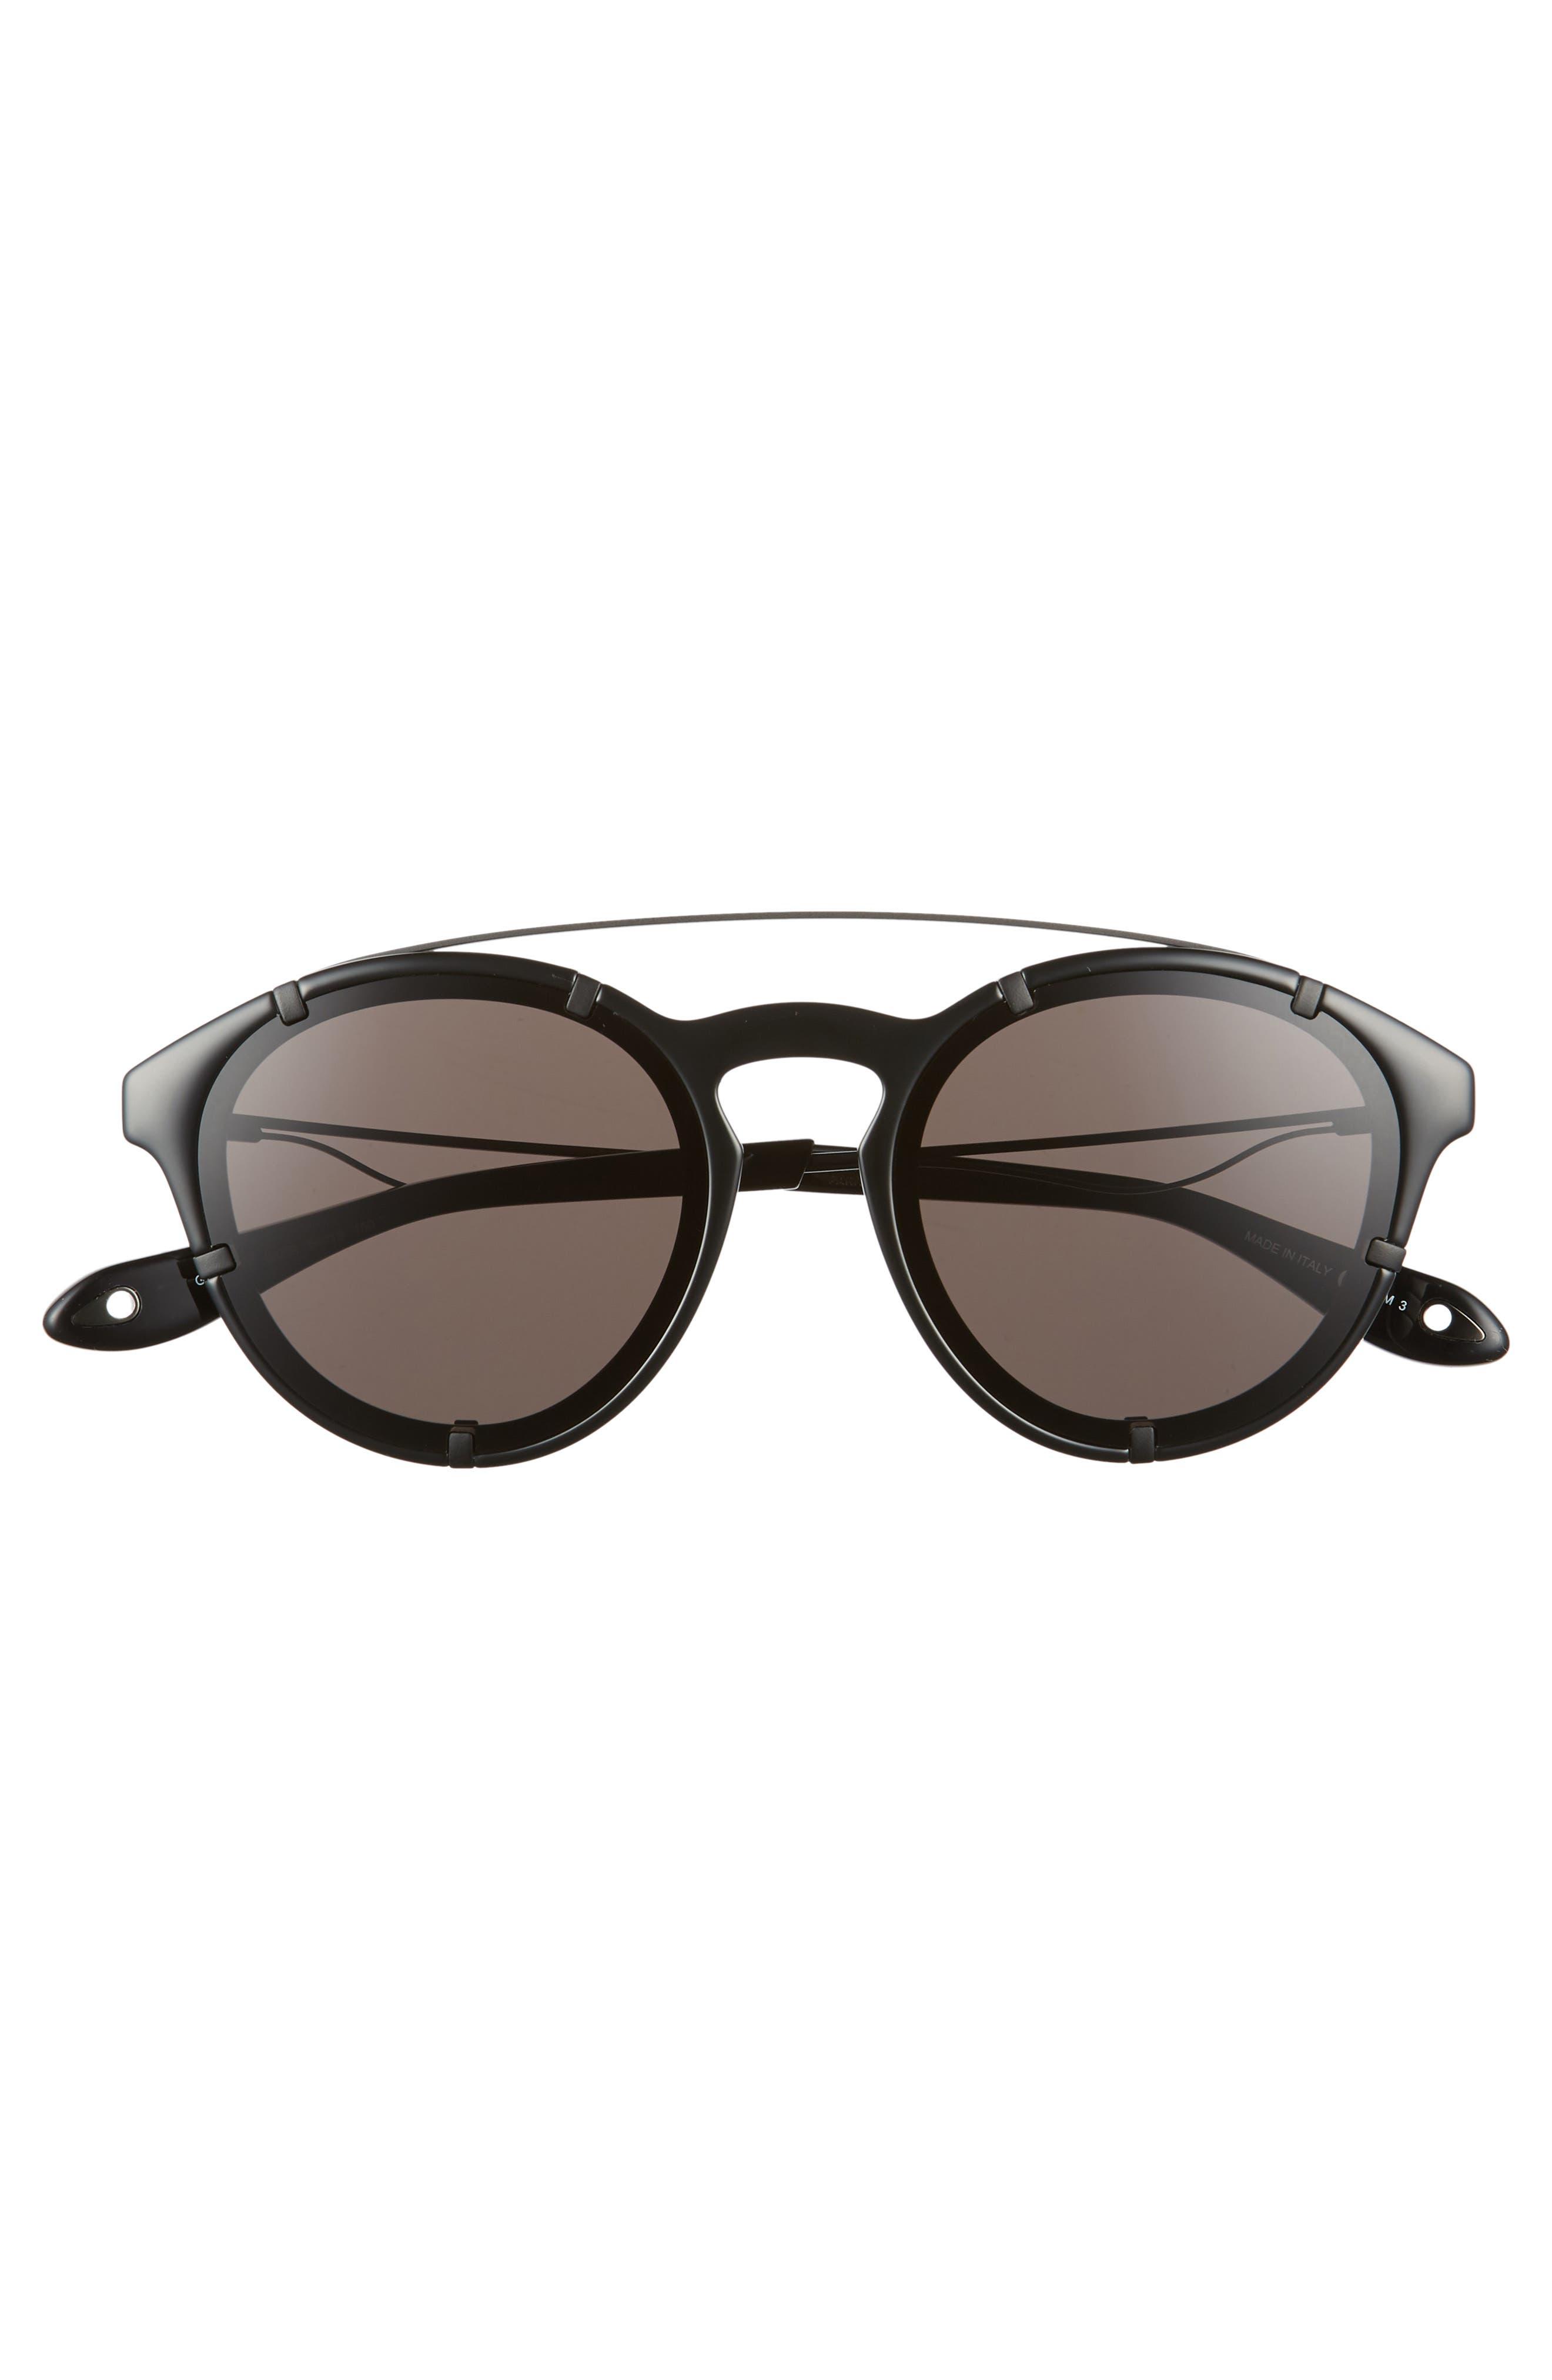 54mm Round Polarized Sunglasses,                             Alternate thumbnail 3, color,                             Black